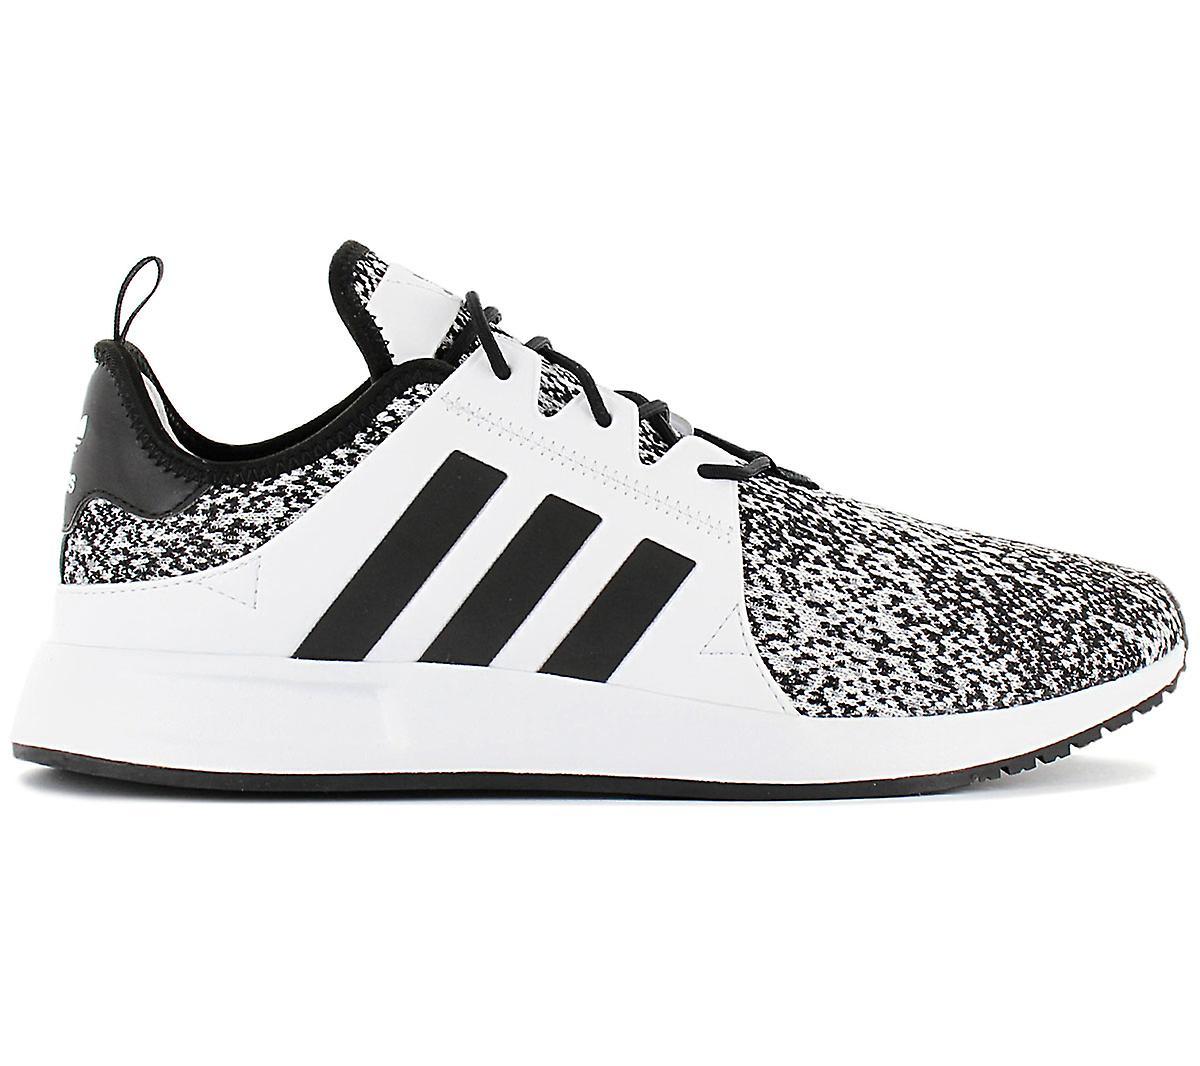 adidas Originals X_PLR B37931 - Chaussures Chaussures Pour hommes White-Black Sneakers Sports Shoes